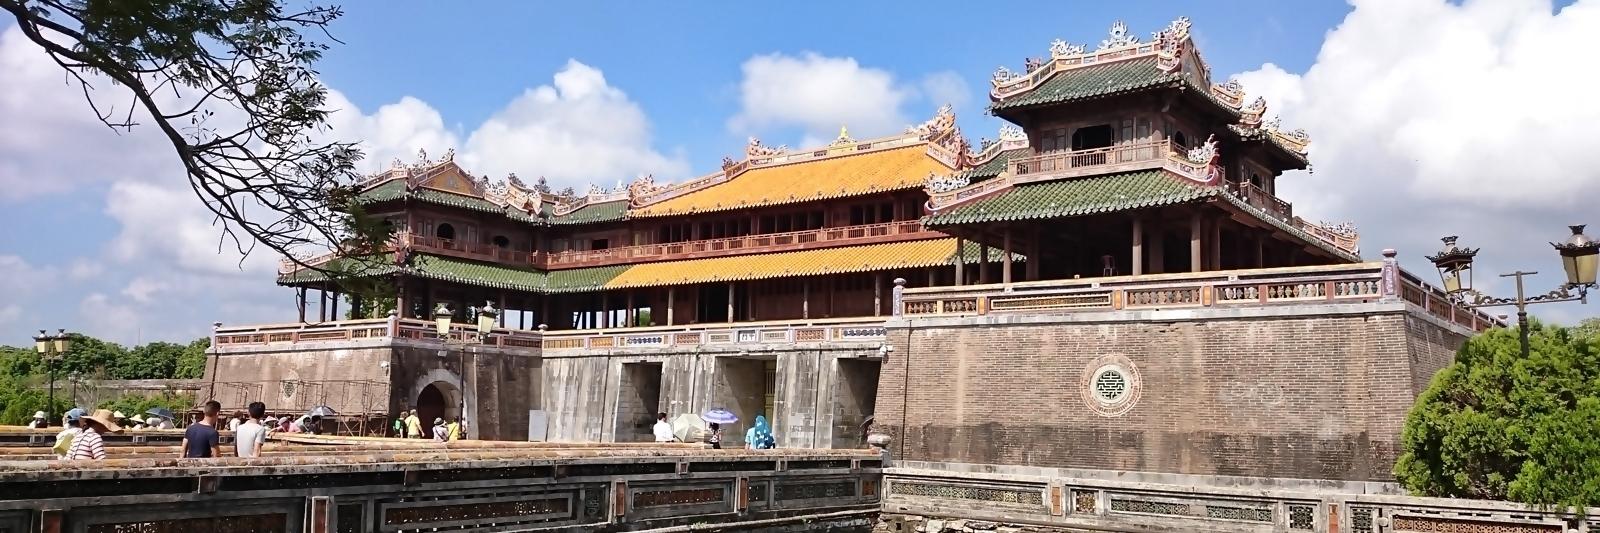 https://gody.vn/blog/bambichau227049/post/mon-ngon-o-hue-goi-ten-cac-mon-bun-tru-danh-ma-nghe-thoi-da-chay-nuoc-mieng-roi-2117